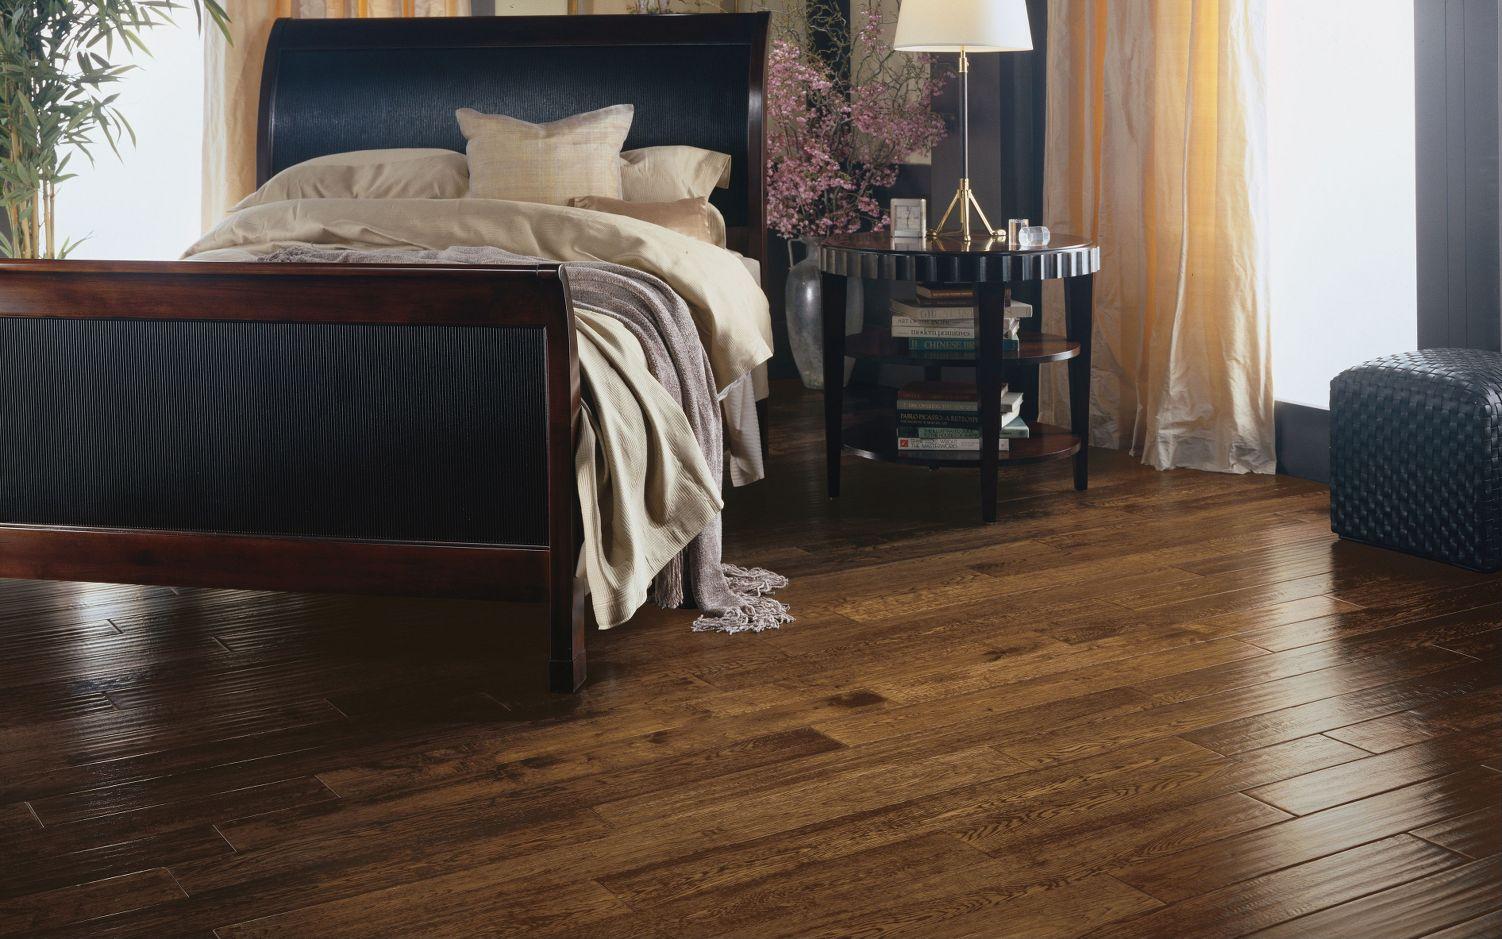 Hardwood Floor Store pittsburgh flooring store carpet tile hardwood floors molyneaux carpet tile wood flooring Hardwood Floor Store Berkeley Heights